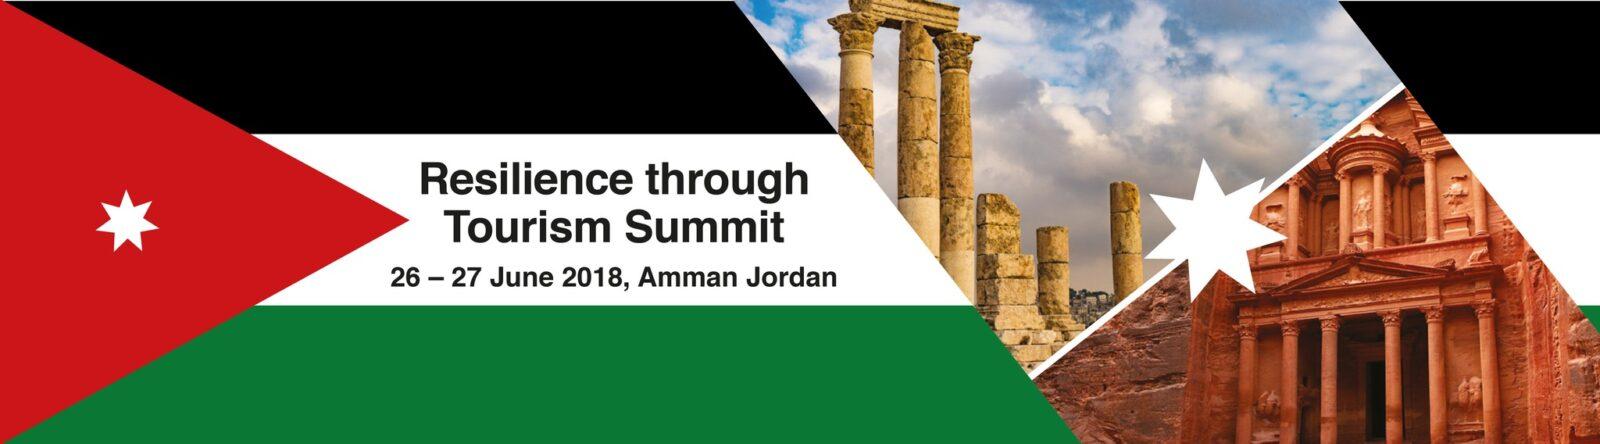 Resilience Through Tourism Summit 2018